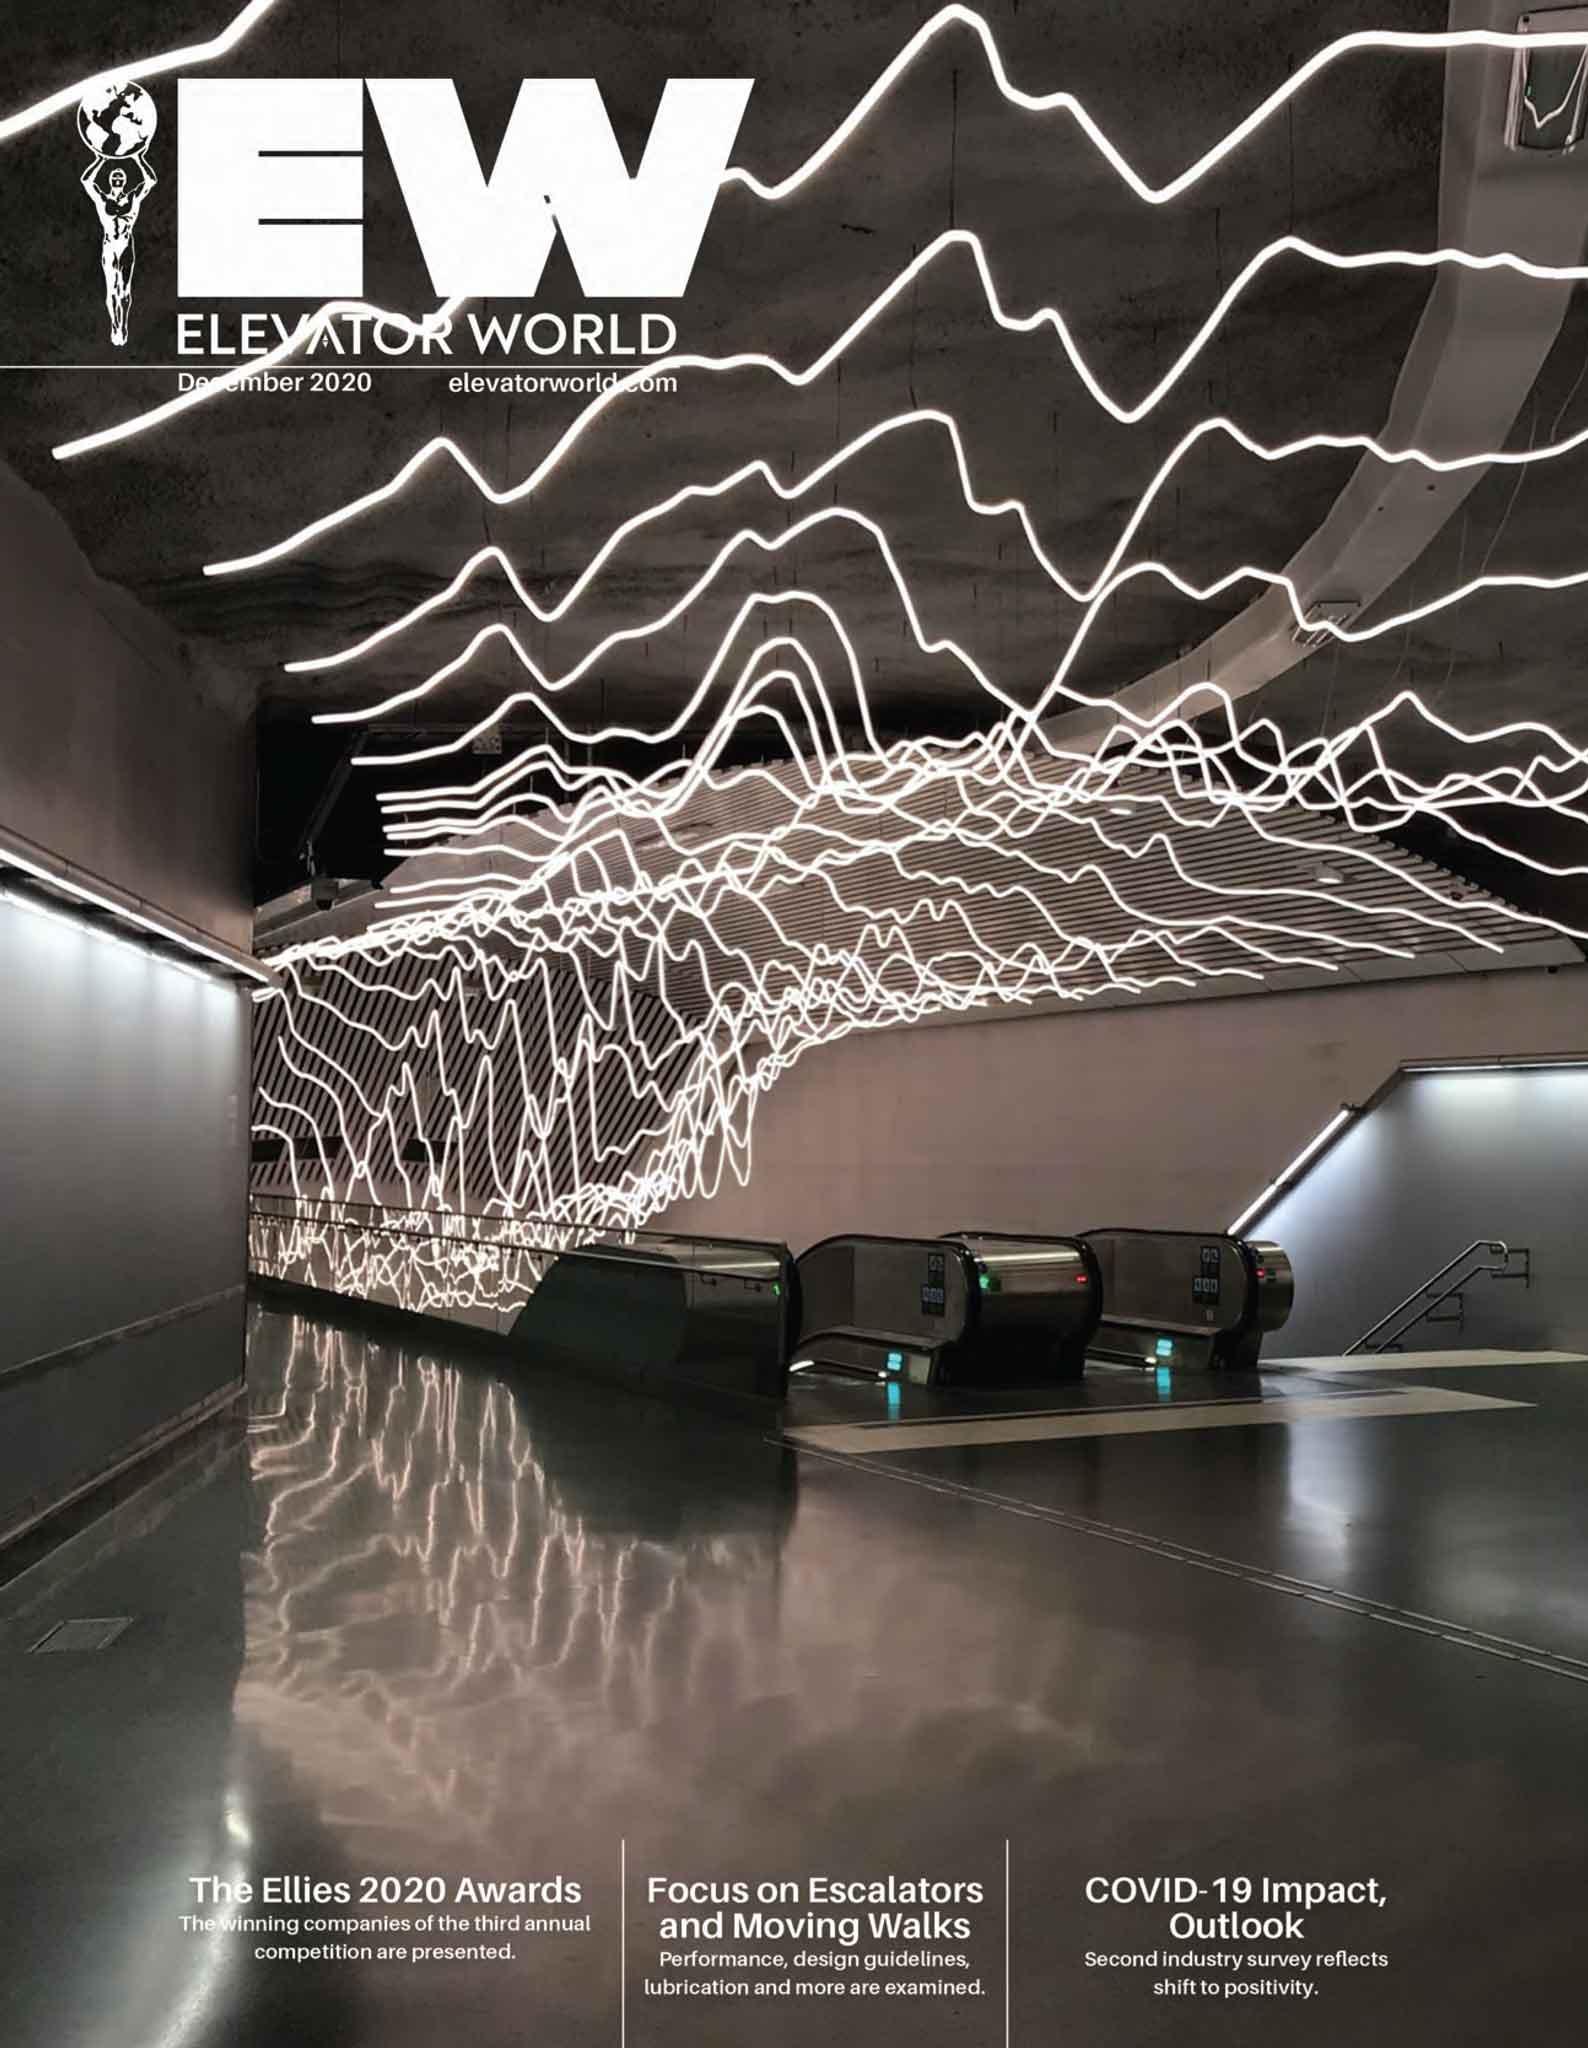 Elevator World | December 2020